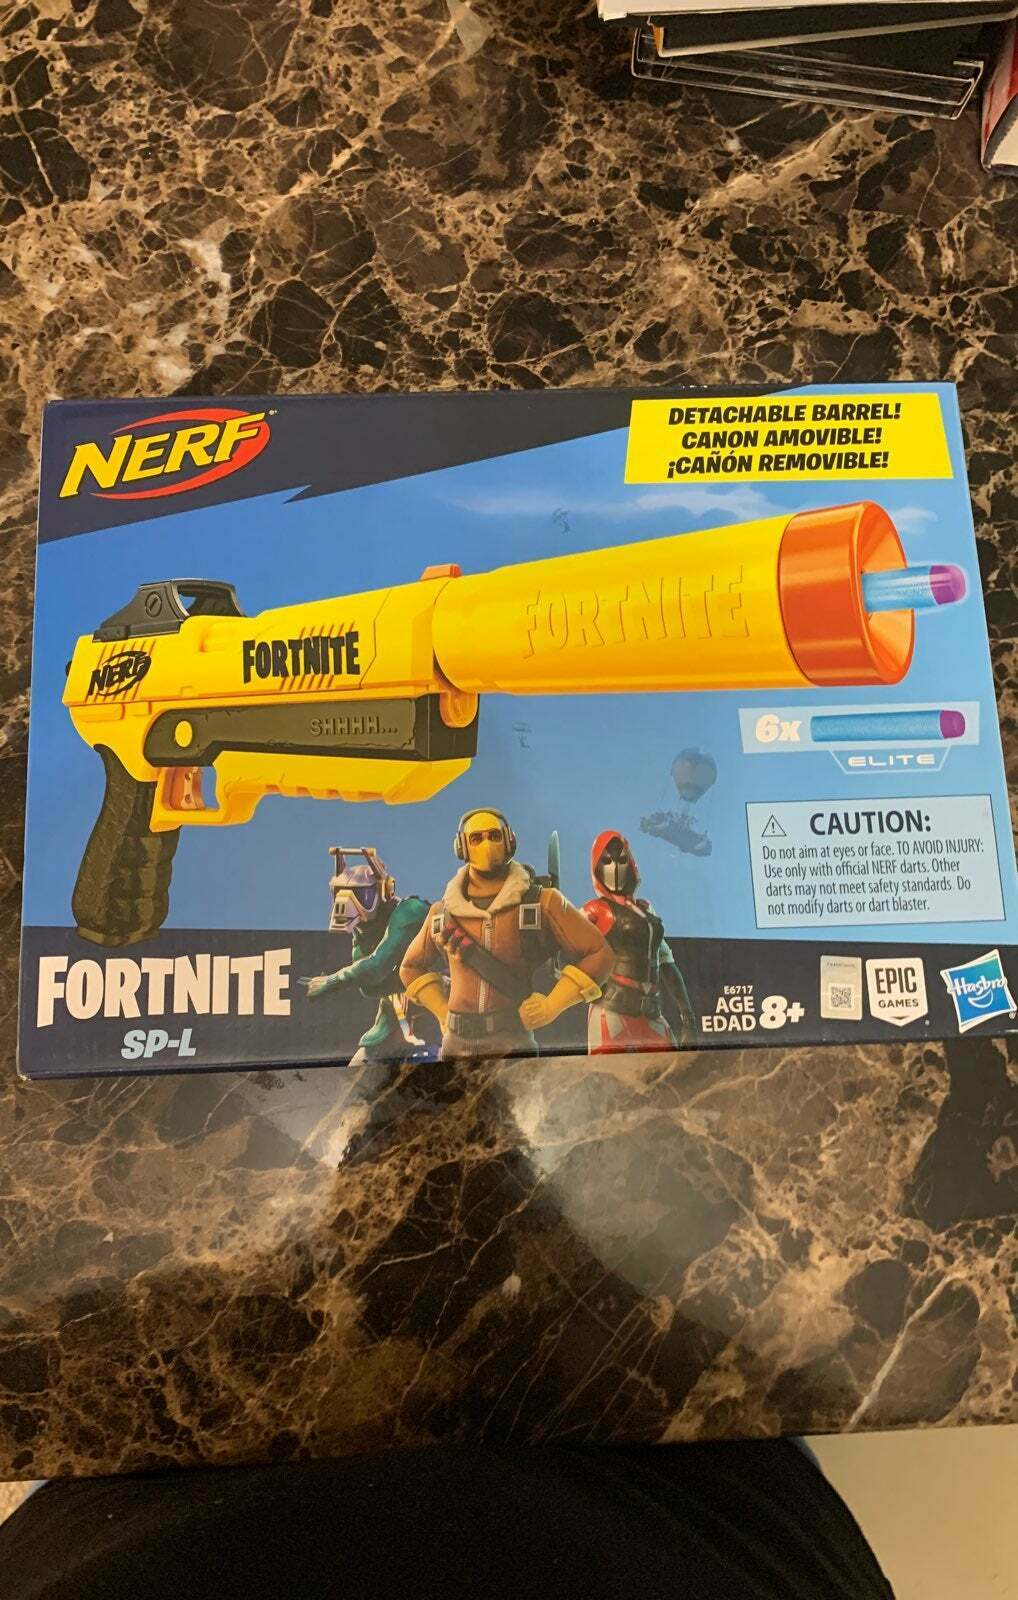 Fortnite Nerf SP-L gun